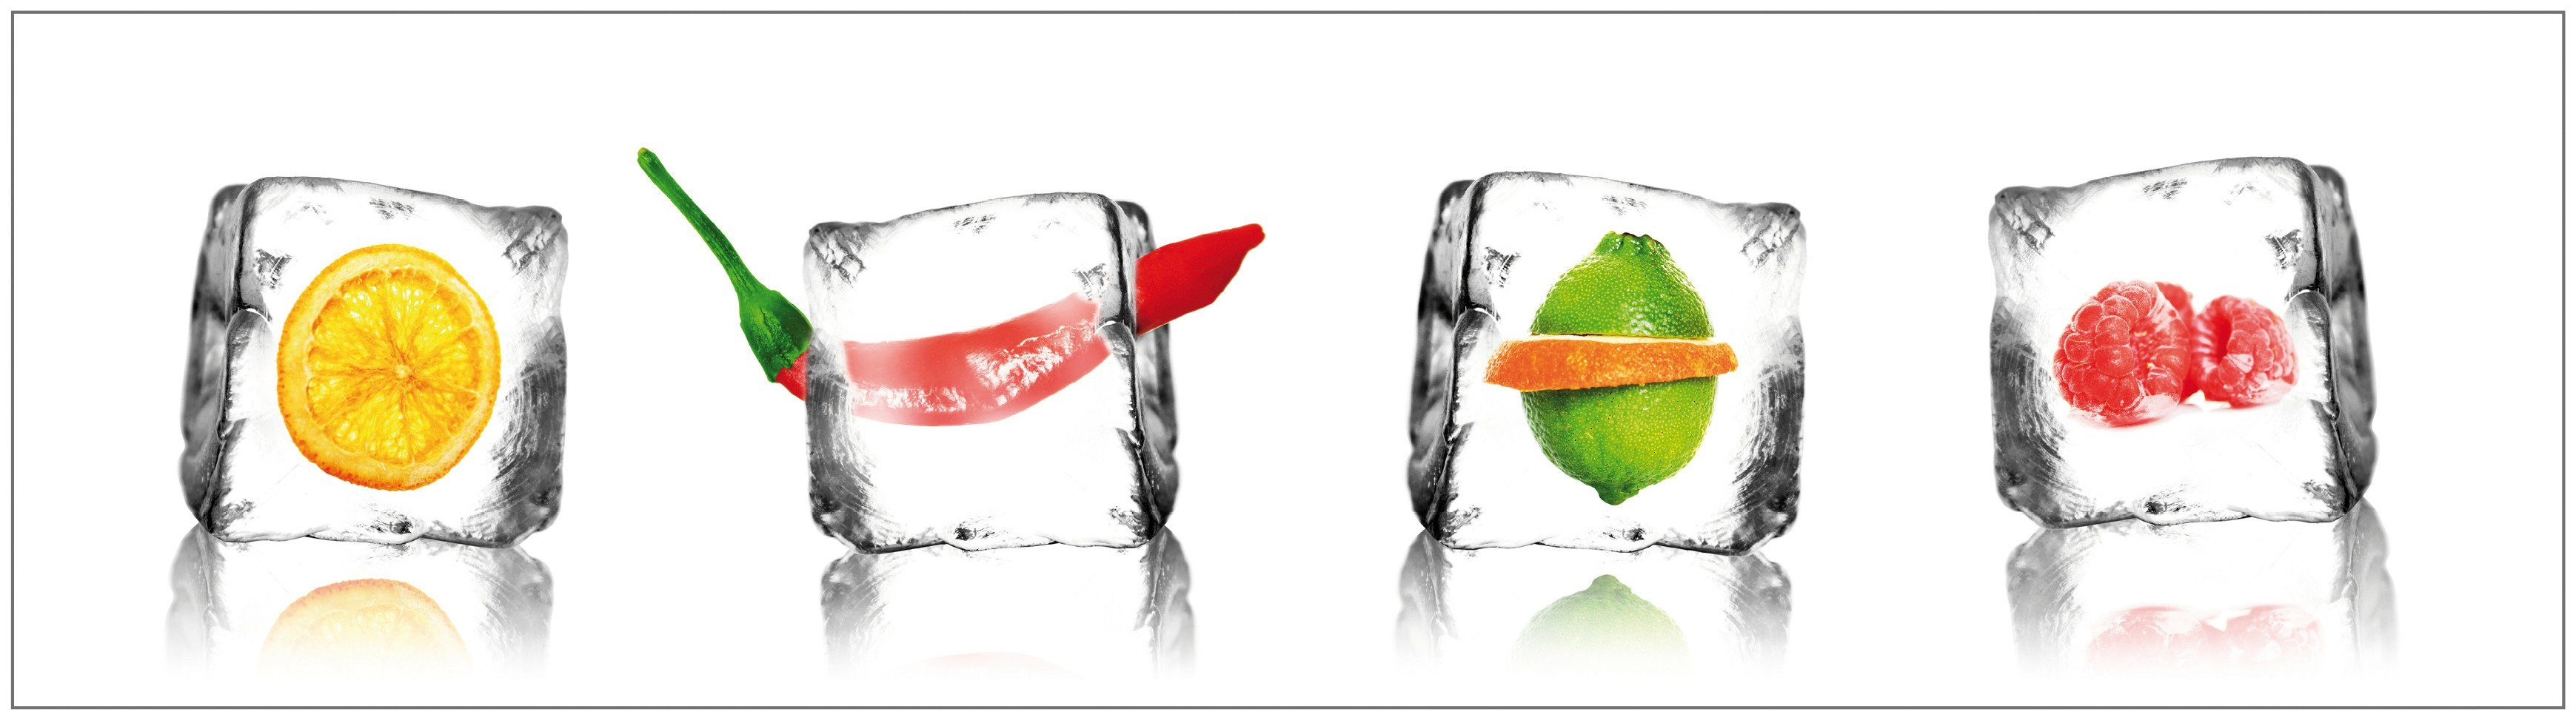 Küchenrückwand - Spritzschutz »profix«, Eisfrüchte, 220x60 cm